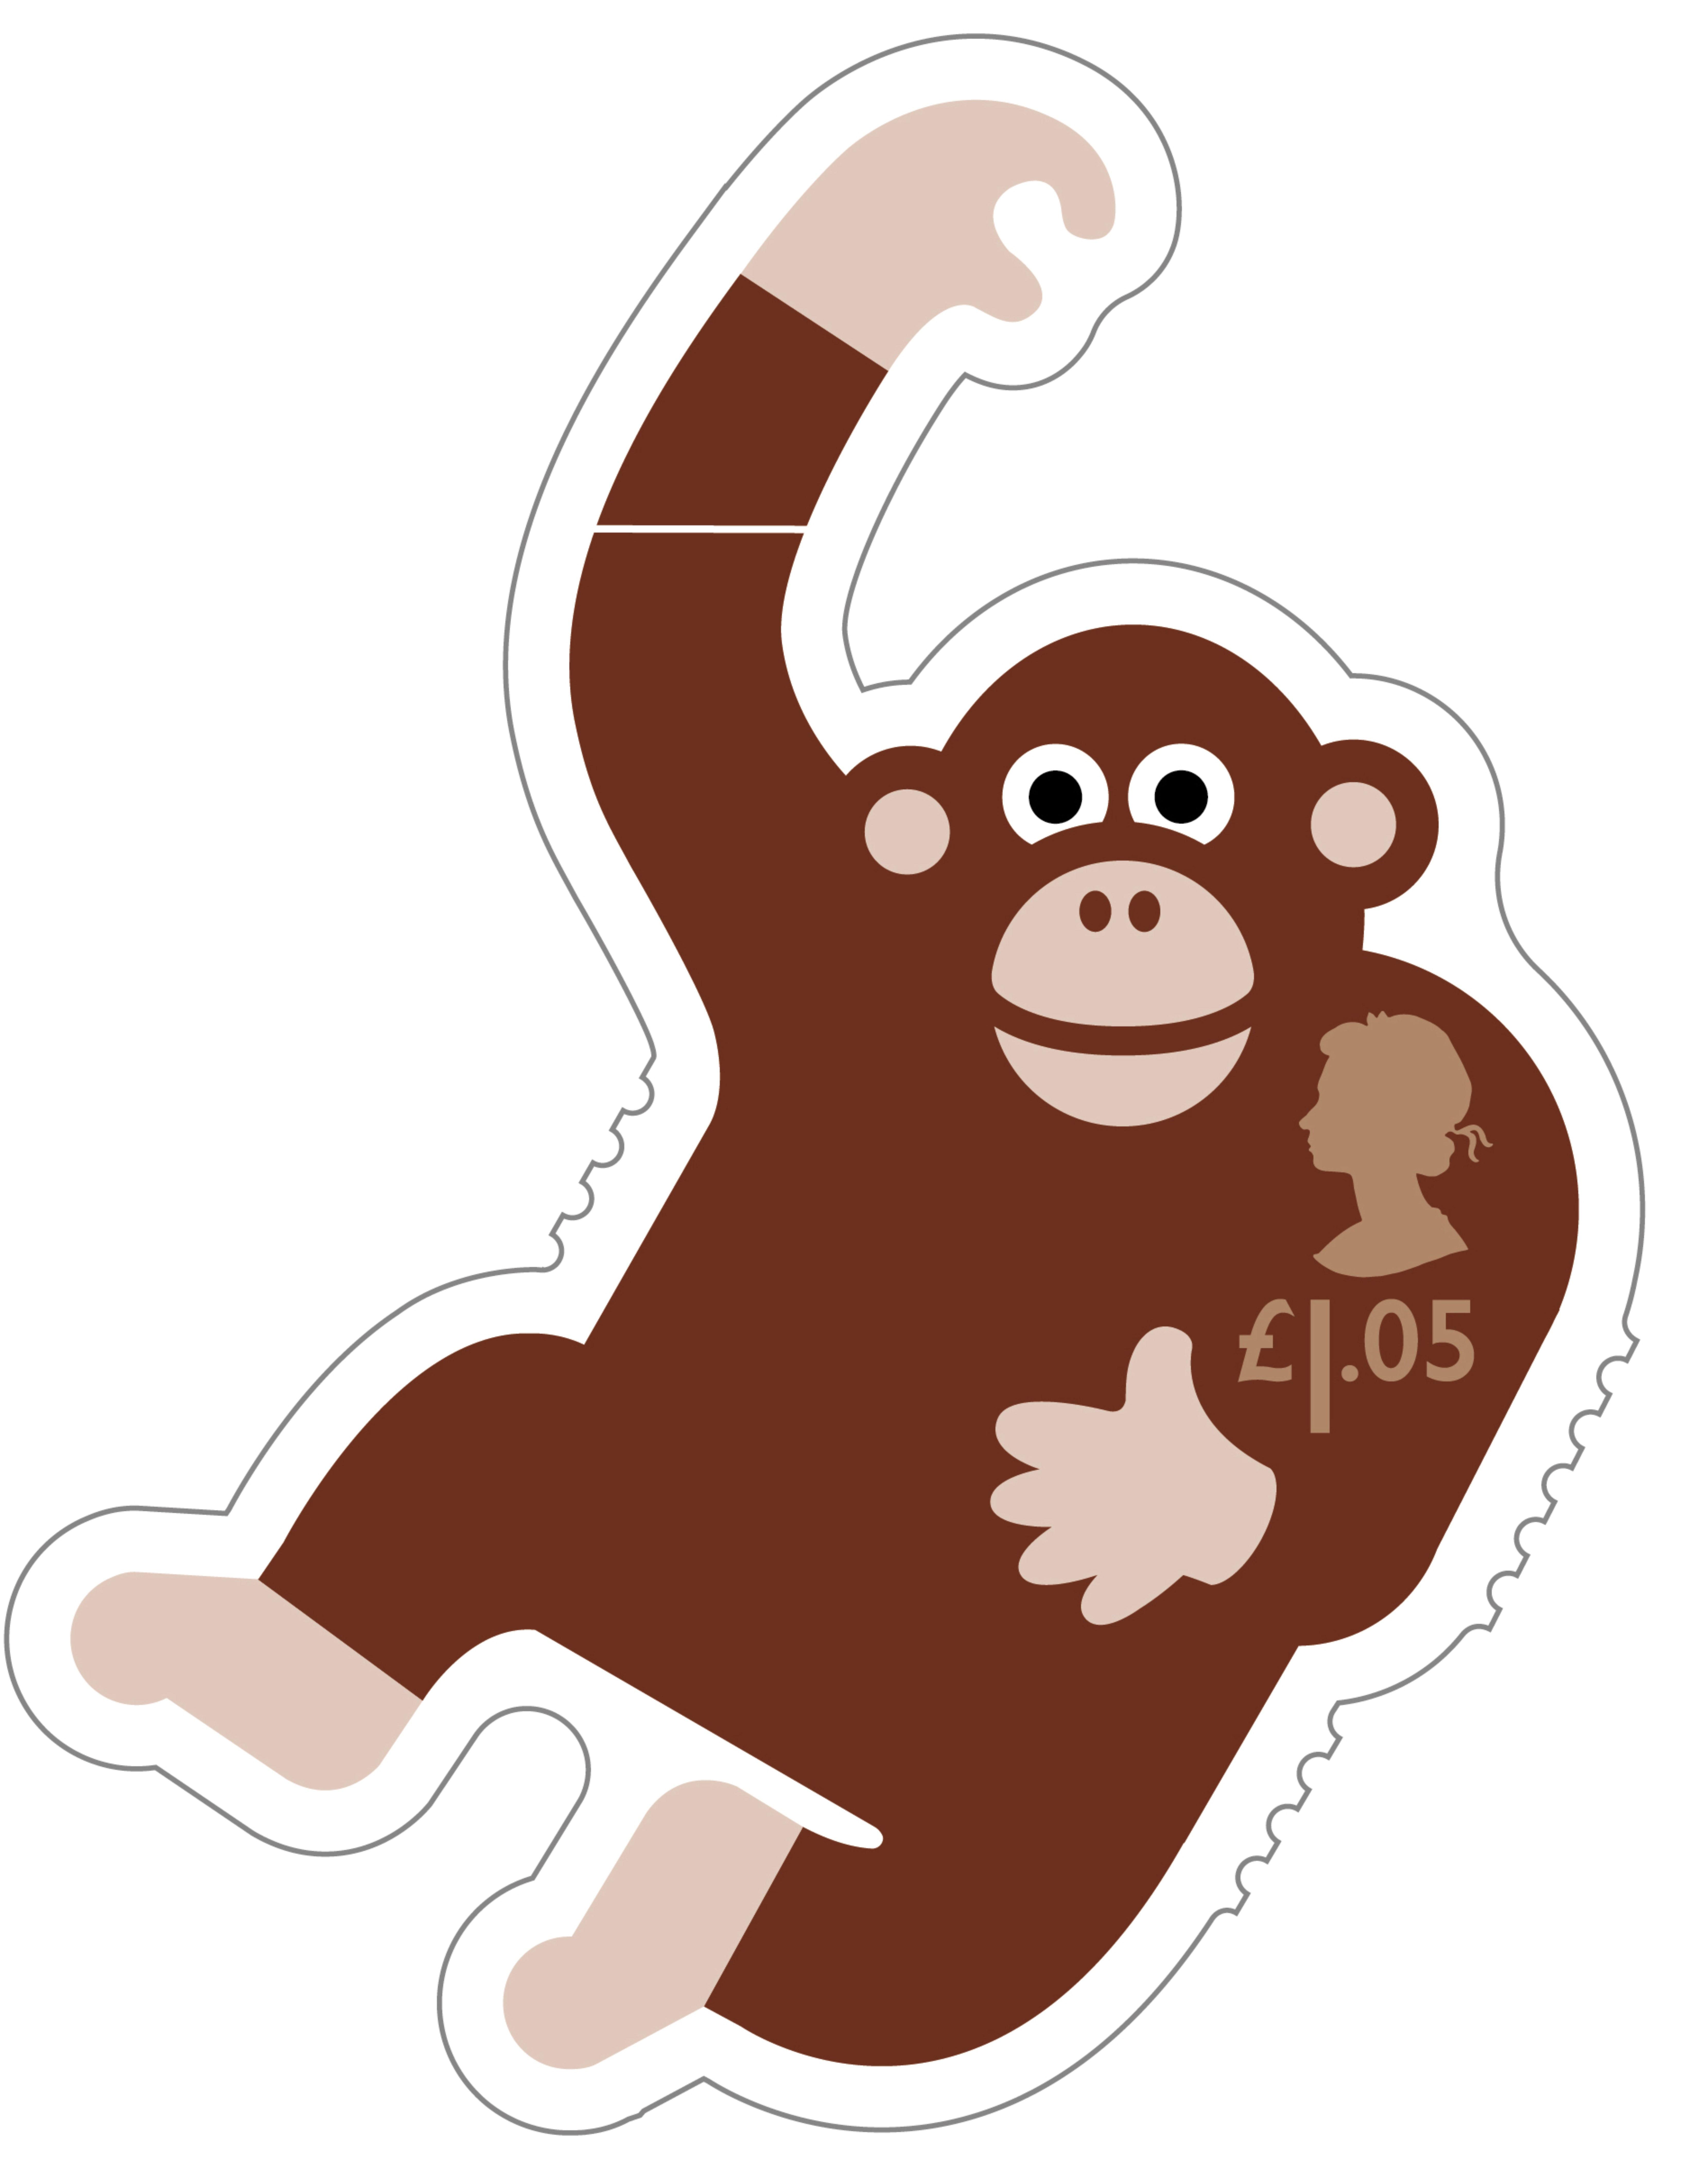 animail stamp 2016 chimpanzee